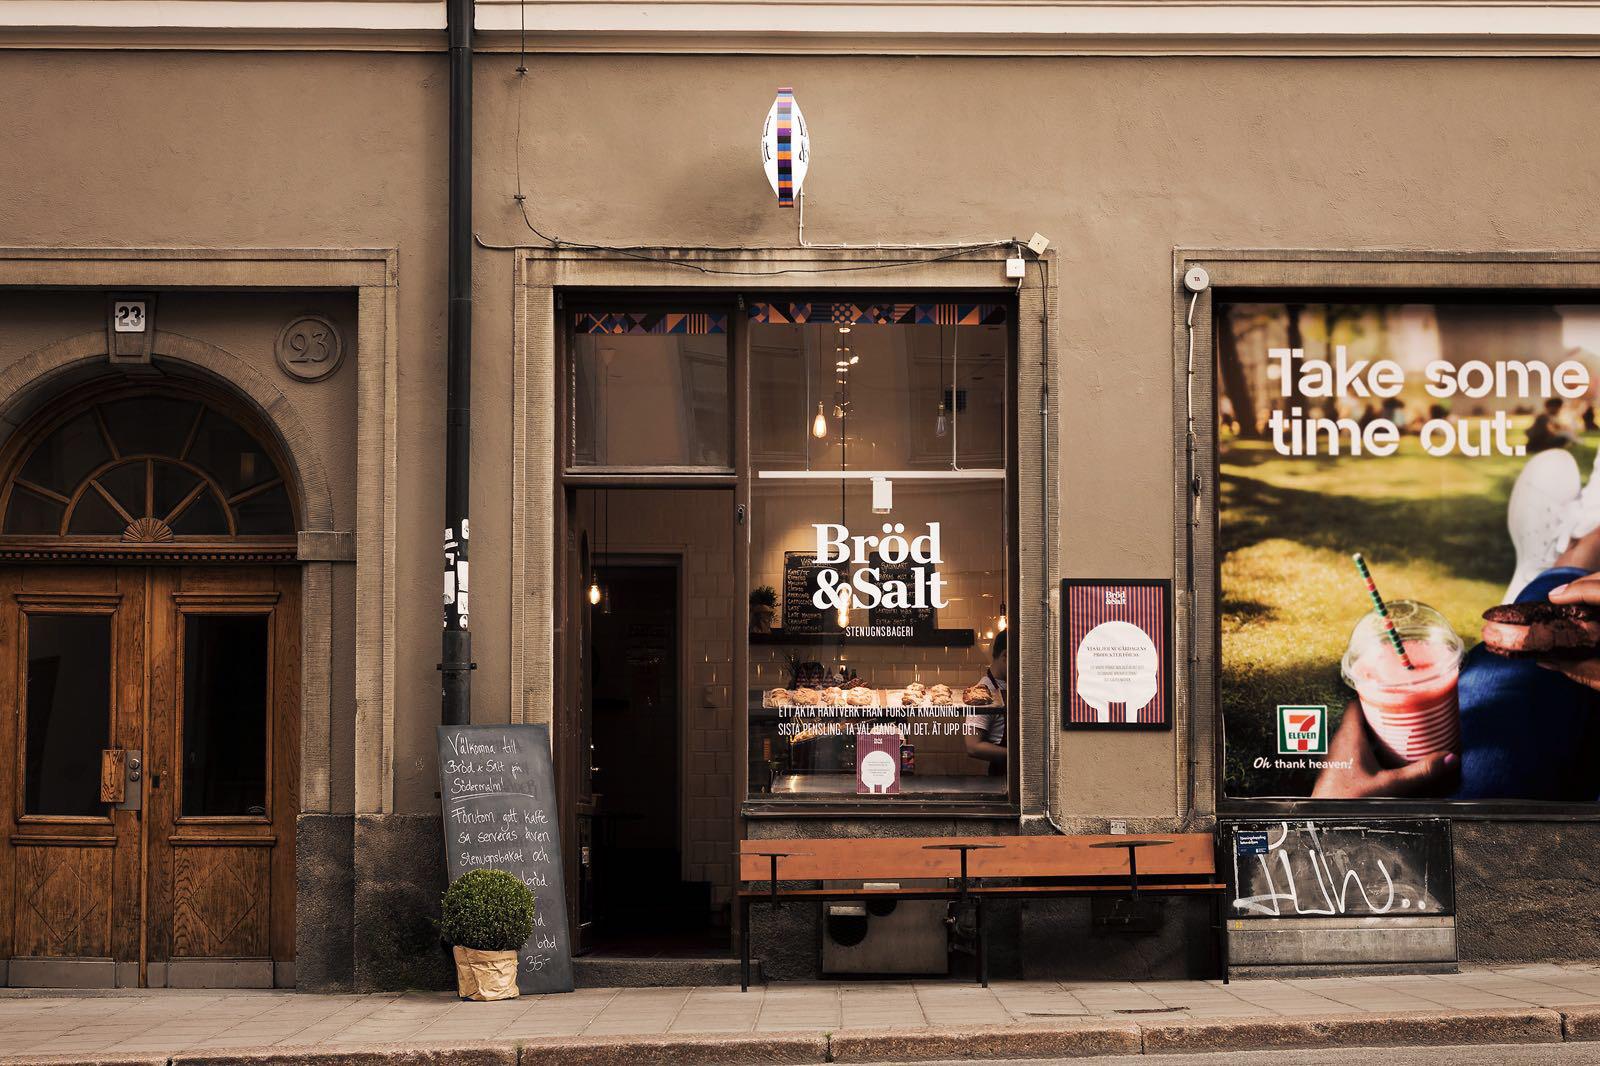 SOFO   Adress:  Renstiernas gata 23, 116 31 Stockholm  Telefon:  070-925 70 29  E-post:   sofo@brodsalt.se   Öppettider:  Måndag - Fredag:  07.00 - 19.00   Lördag:  08.00 - 16.00  Sön:  09.00 - 16.00     Hitta Hit